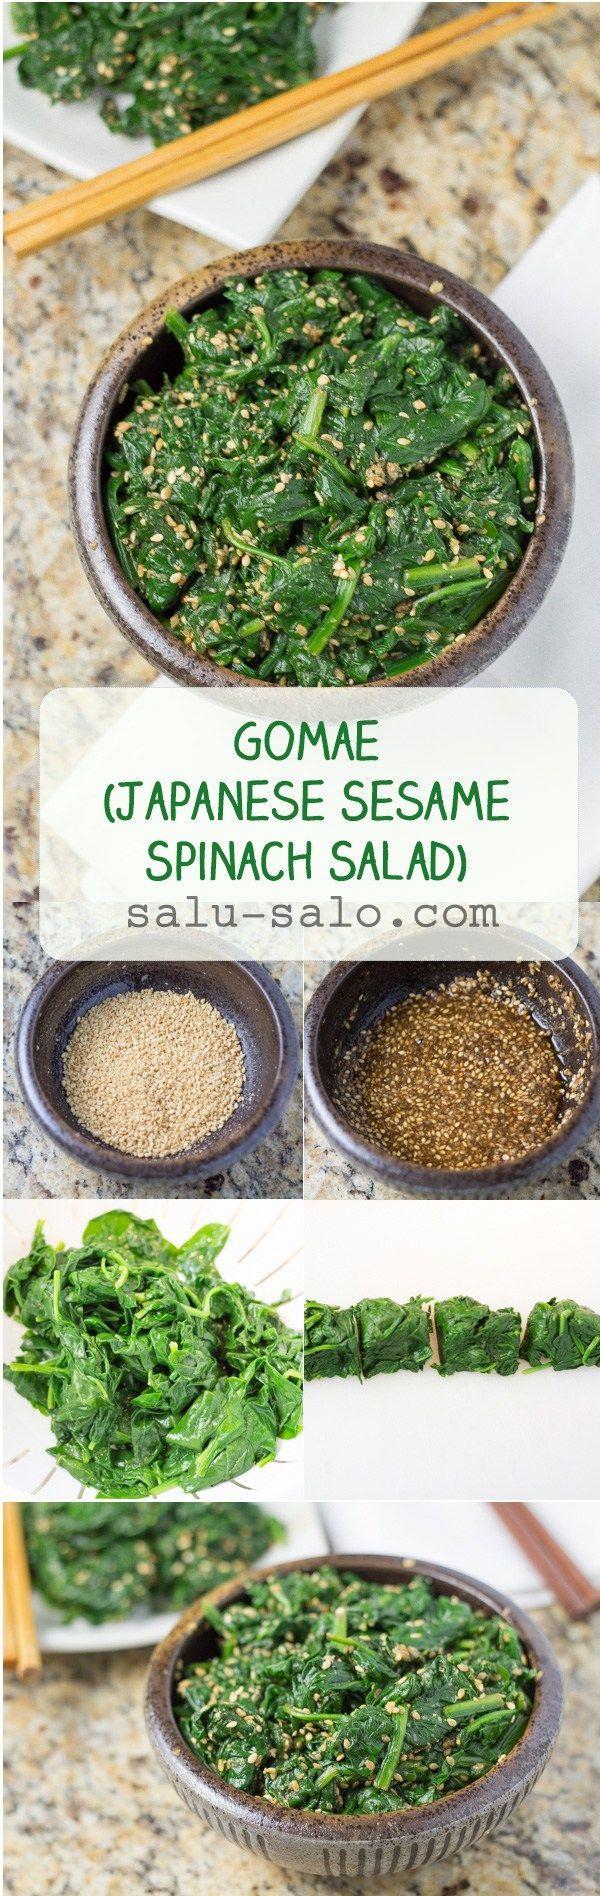 Gomae Japanese Spinach Salad - easy vegan asian side dish recipe